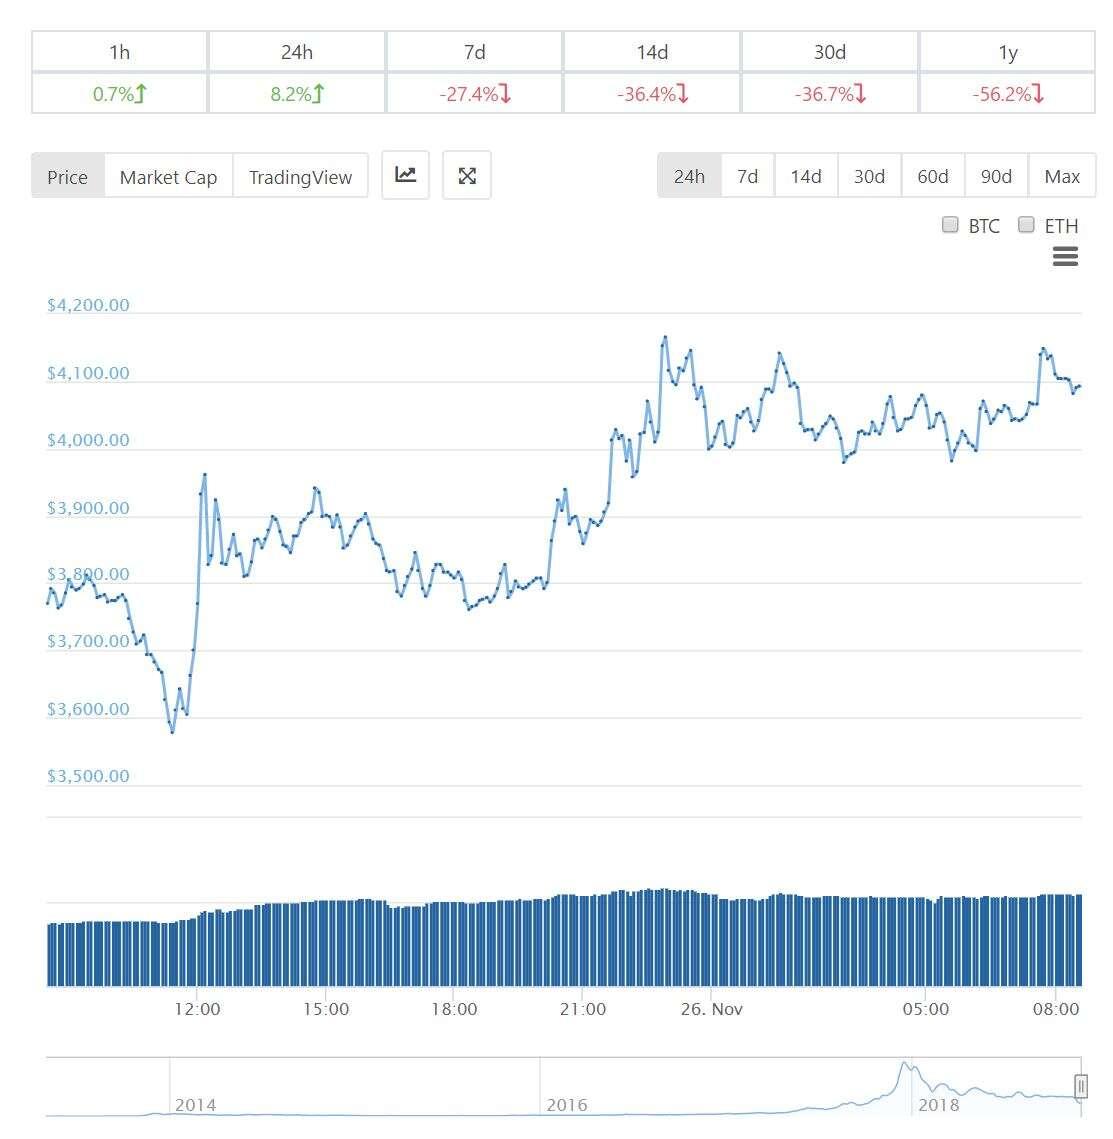 Bitcoin, wartość Bitcoin, kryptowaluty, spadek wartości kryptowalut, cena bitcoina